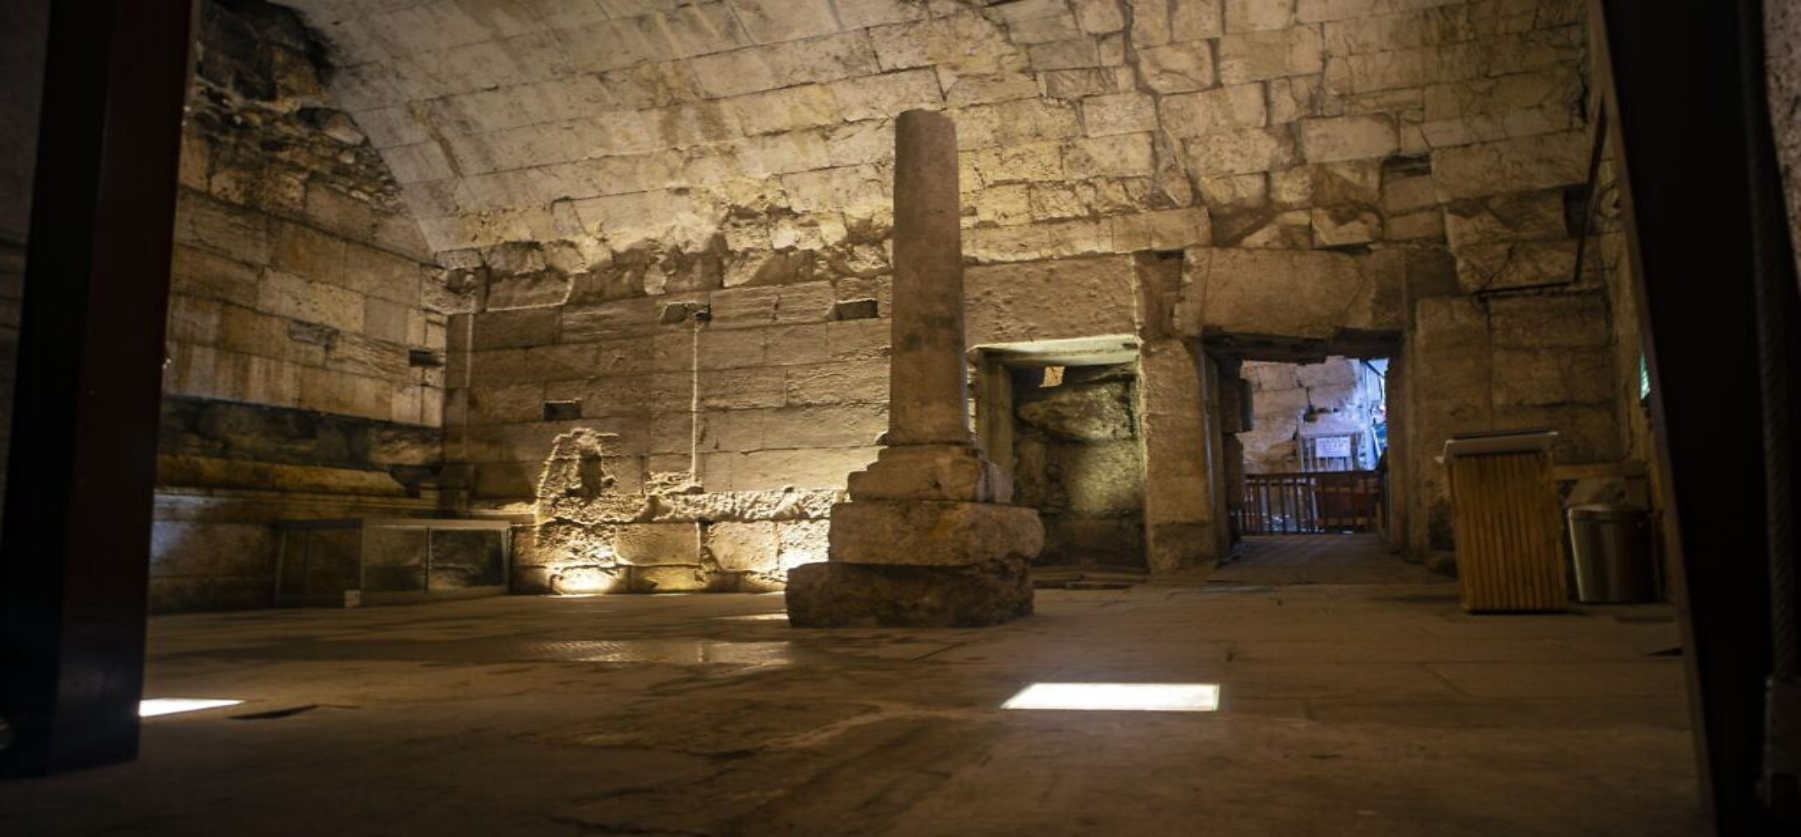 More Discoveries Under Jerusalem's Old City